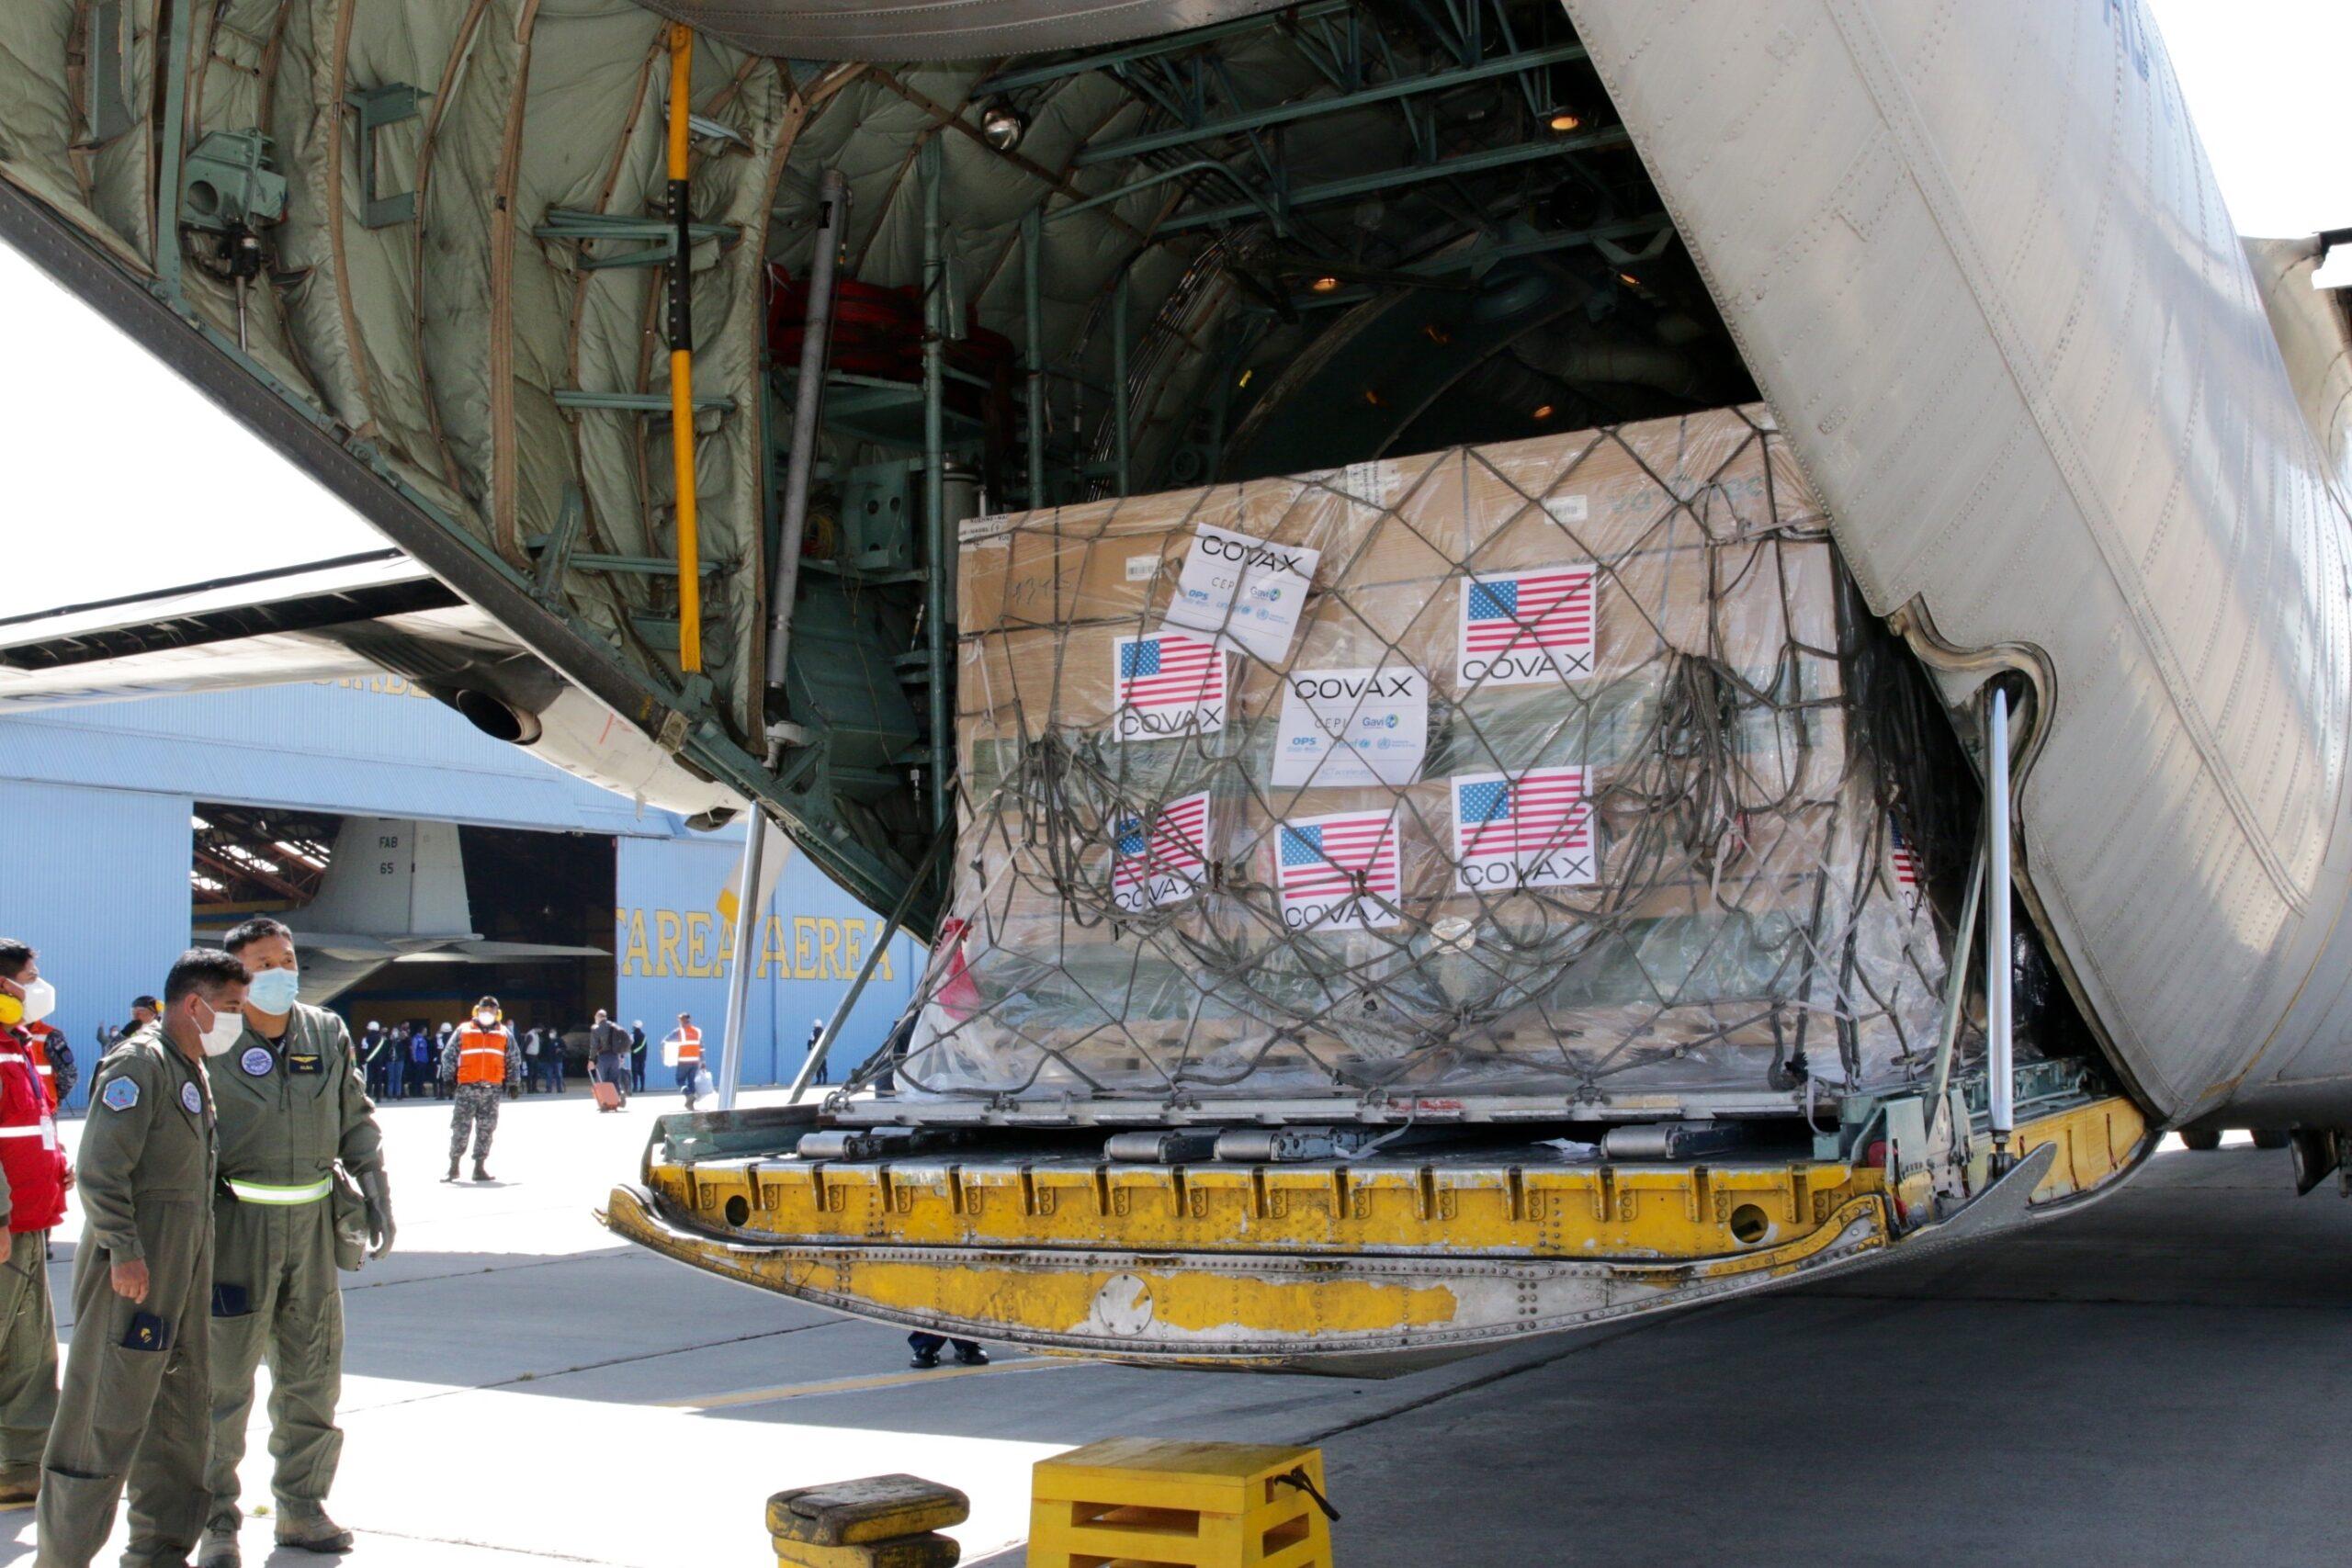 Unloading of more than 1 million Johnson & Johnson vaccines in El Alto